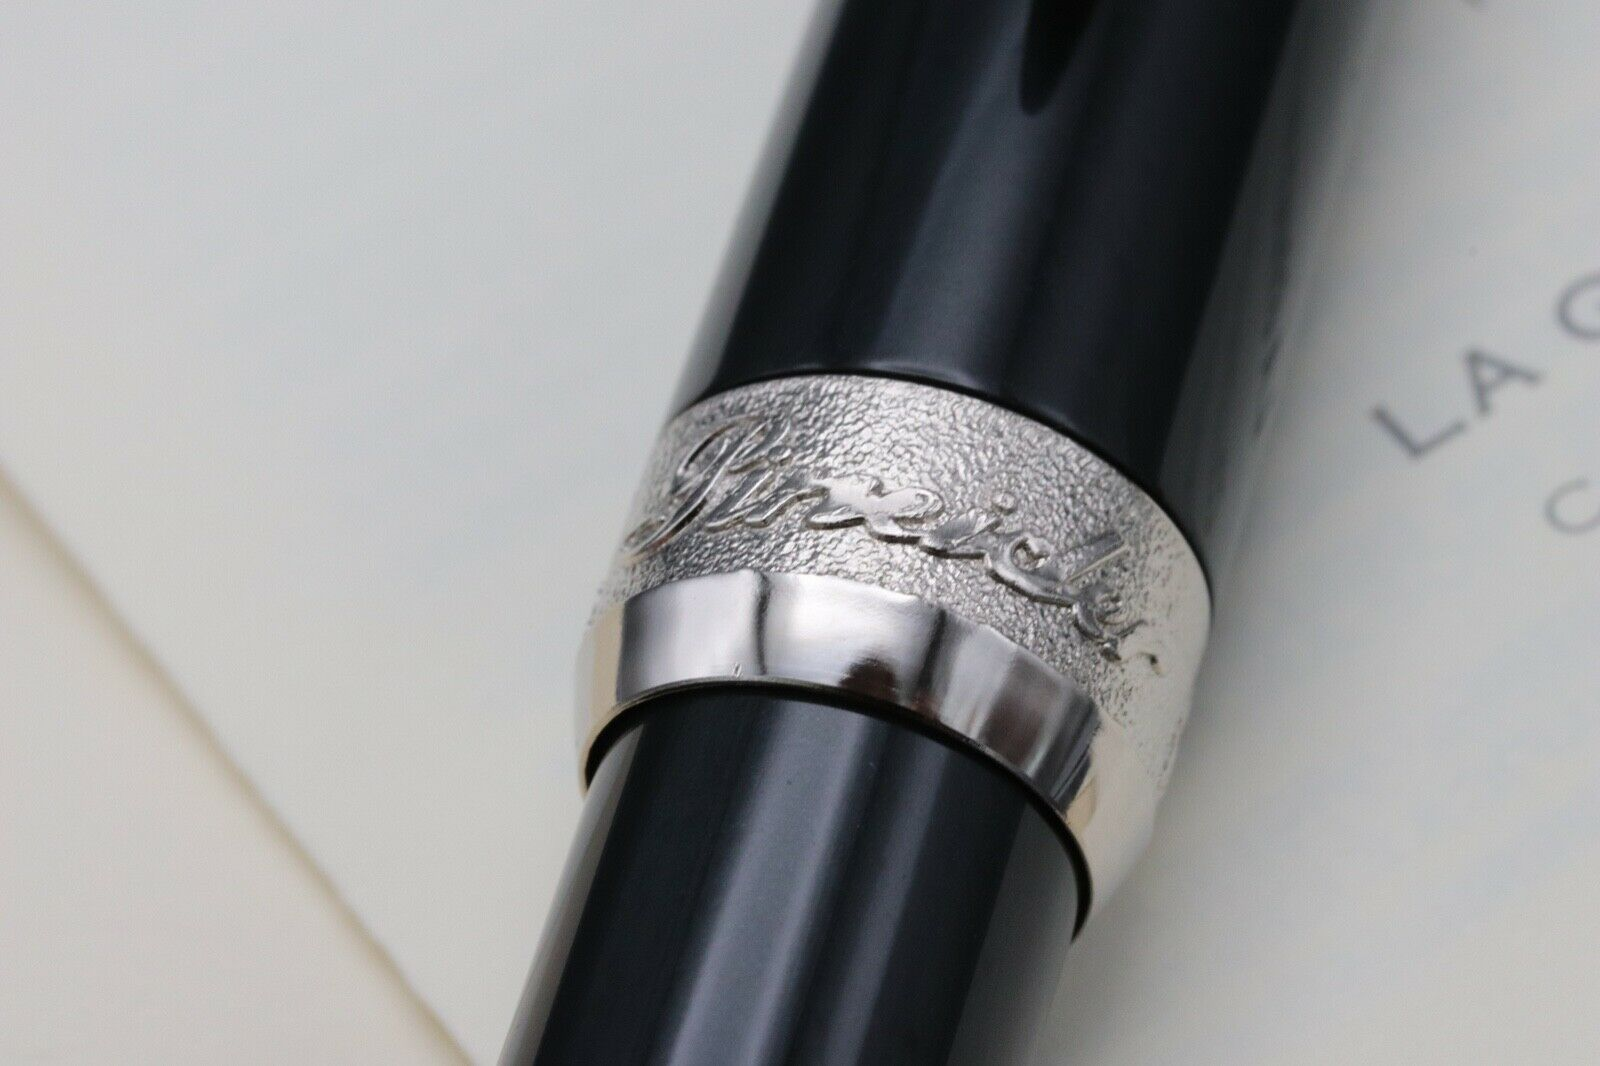 Pineider La Grande Bellezza Gemstones Hematite Grey Fountain Pen 3